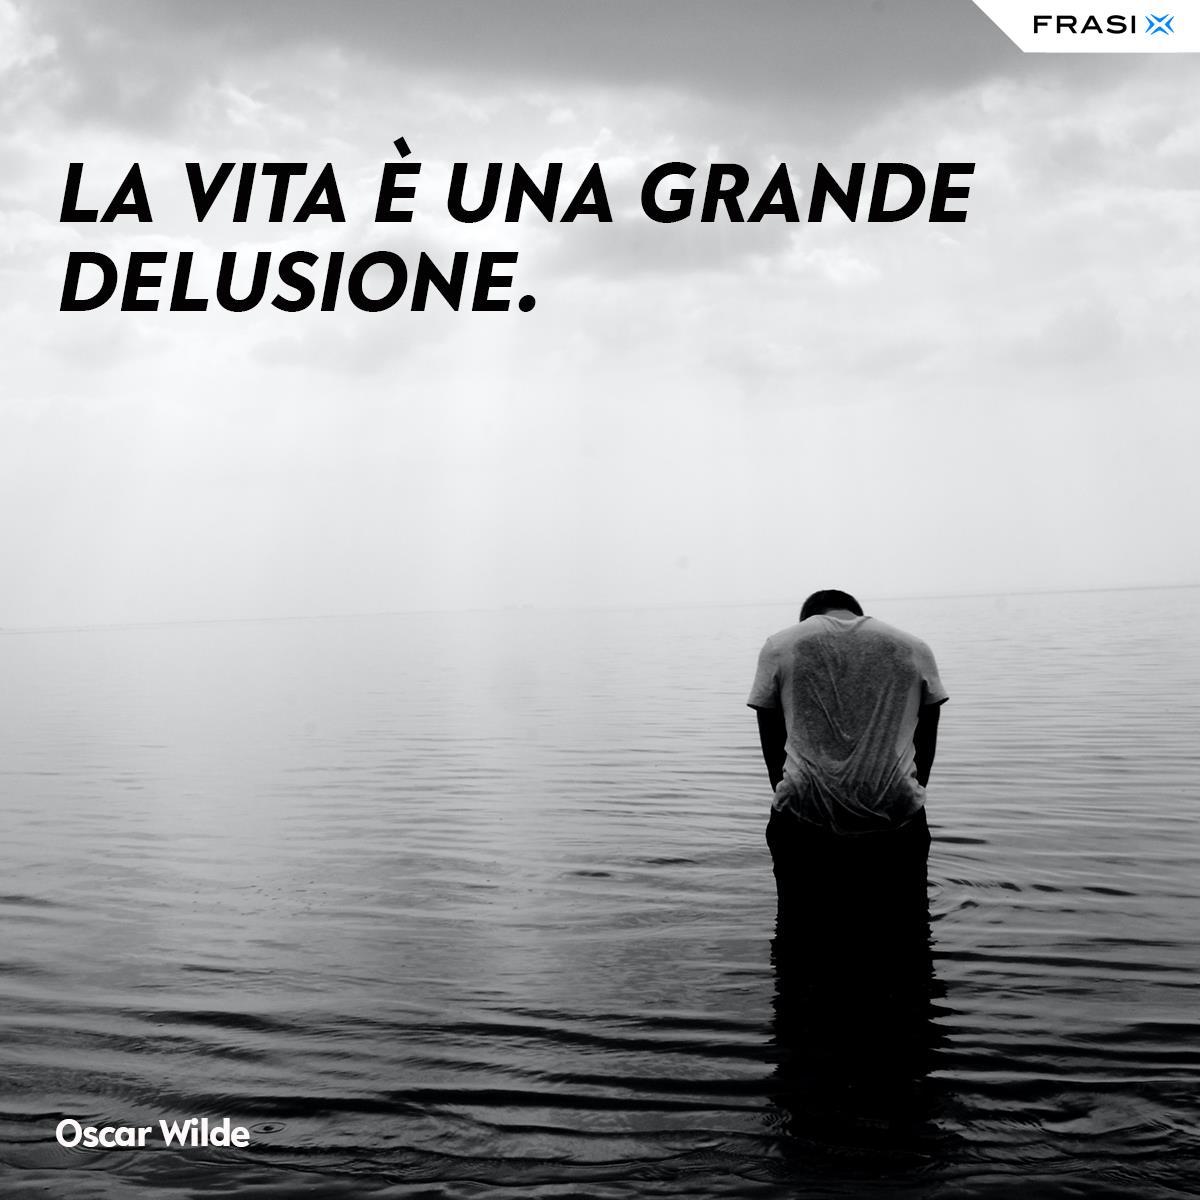 Frasi depresse sulla vita Oscar Wilde